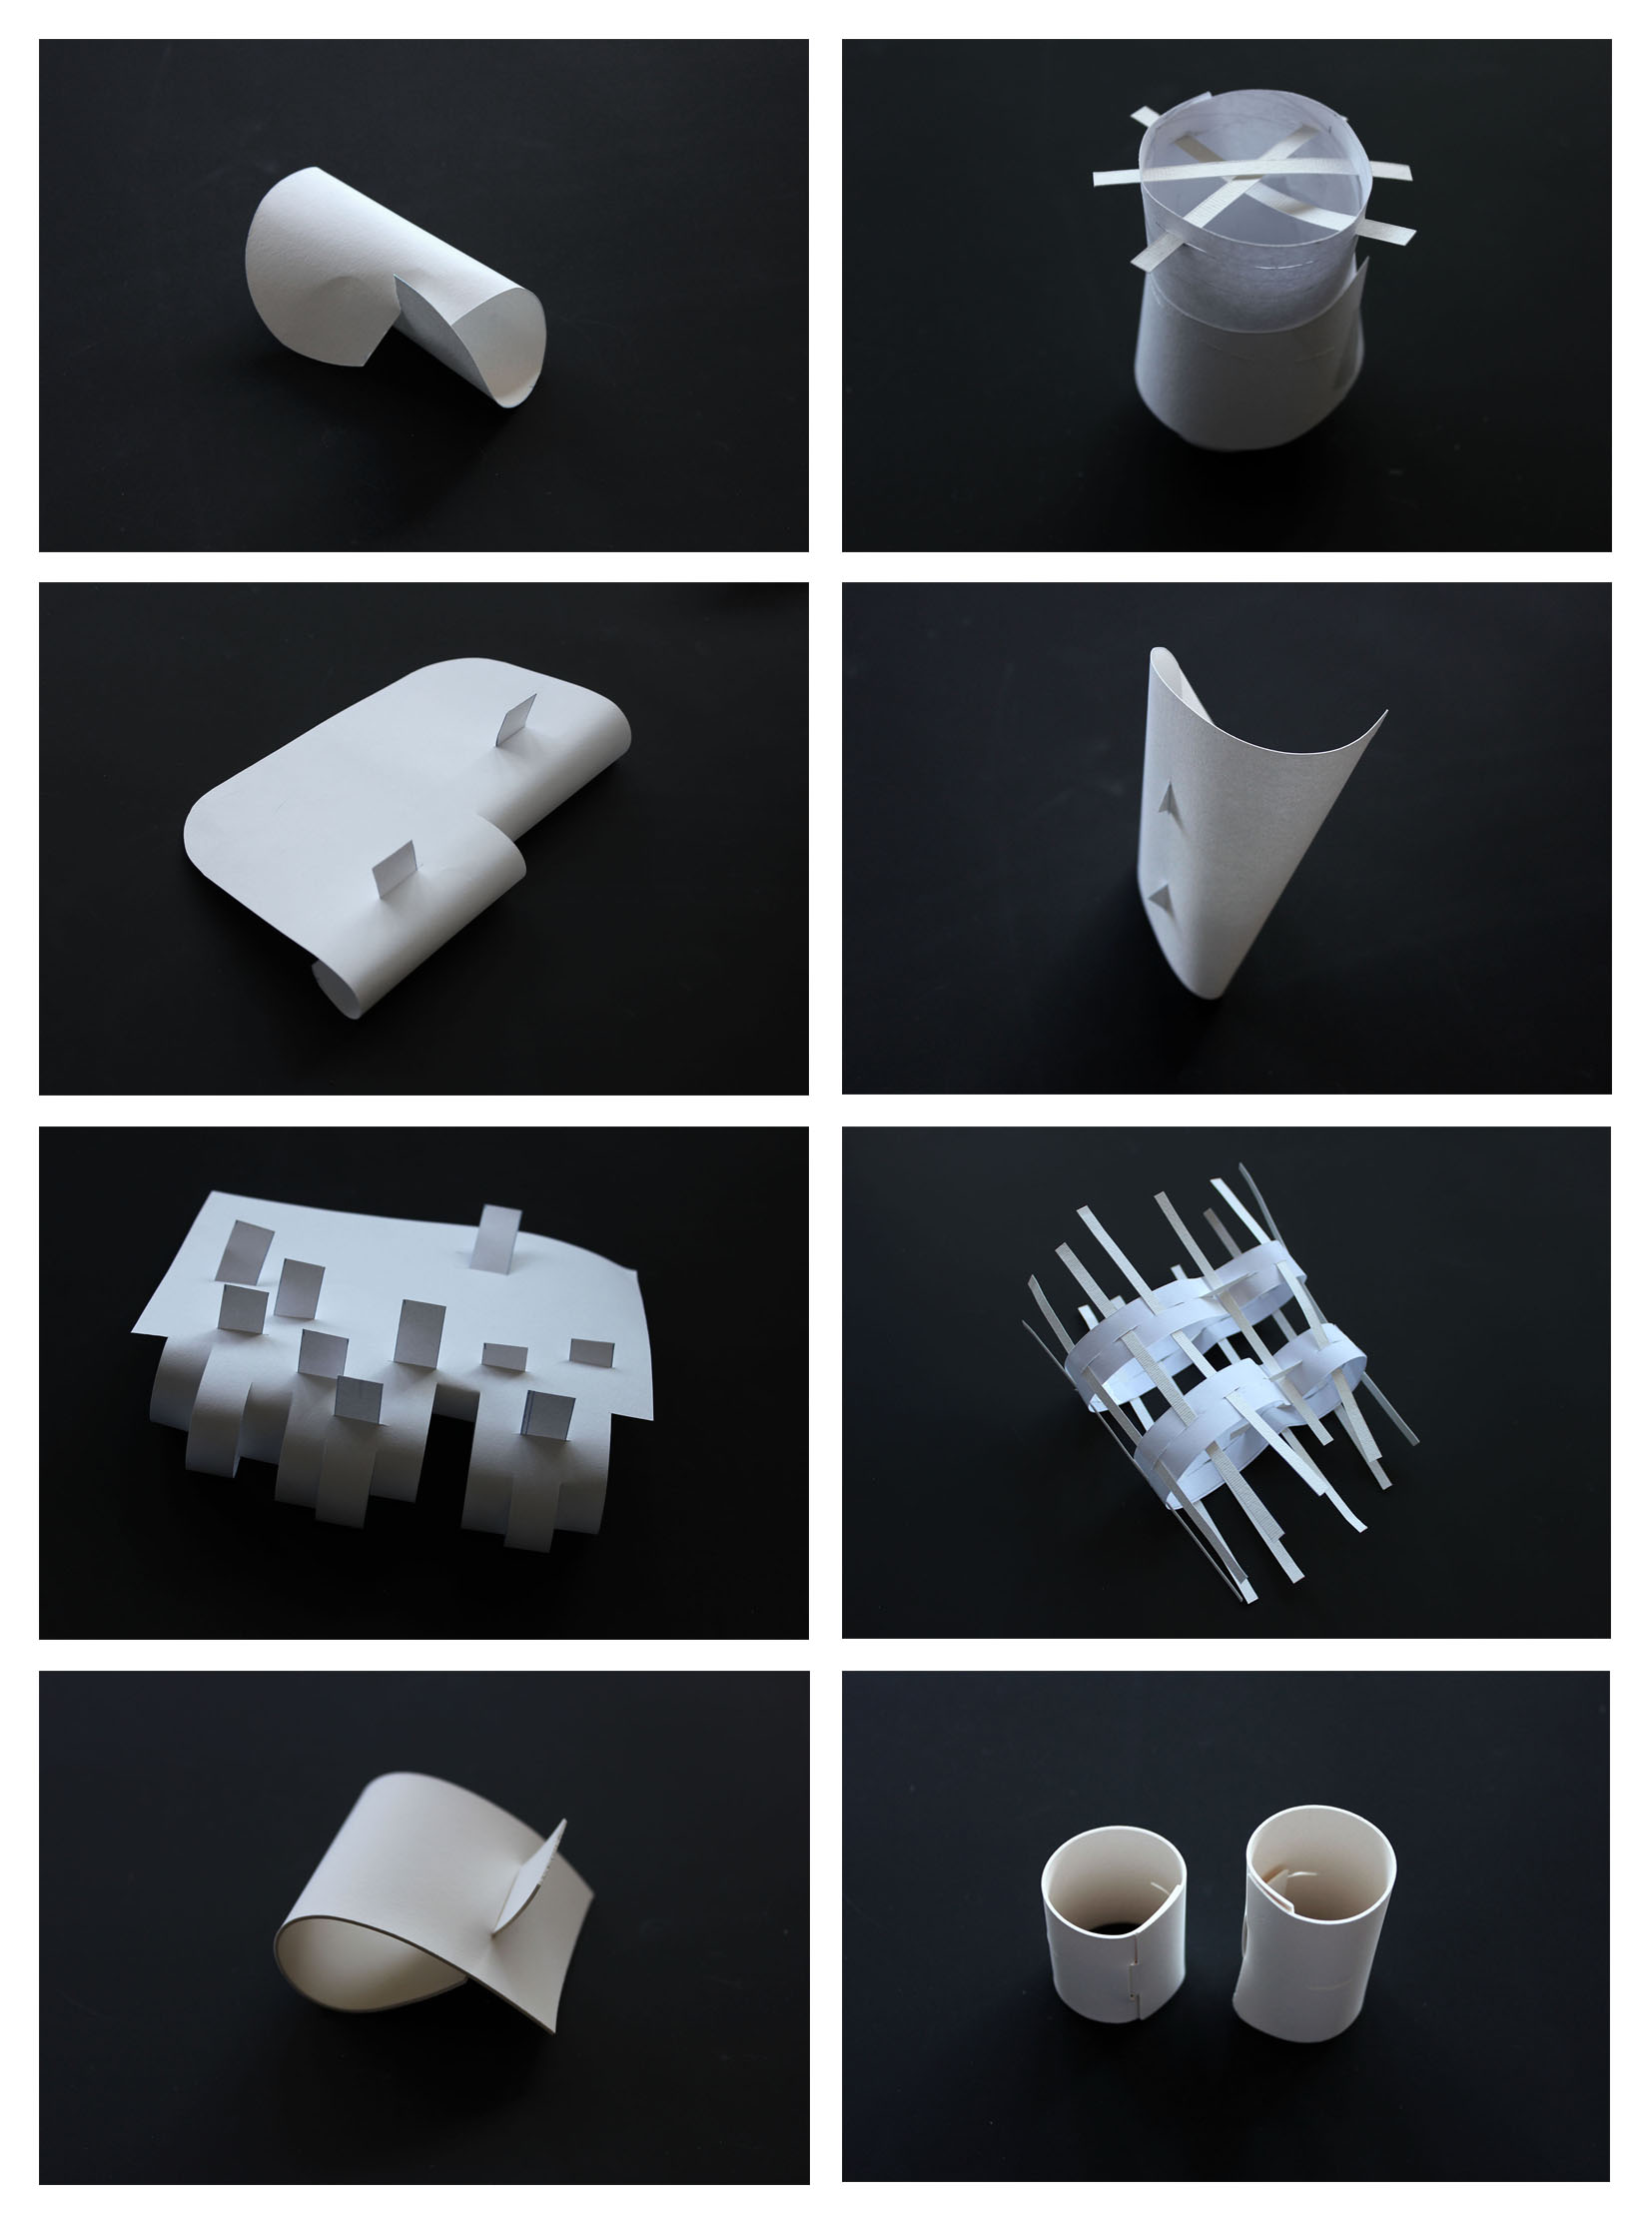 grille lamp shapes2.jpg